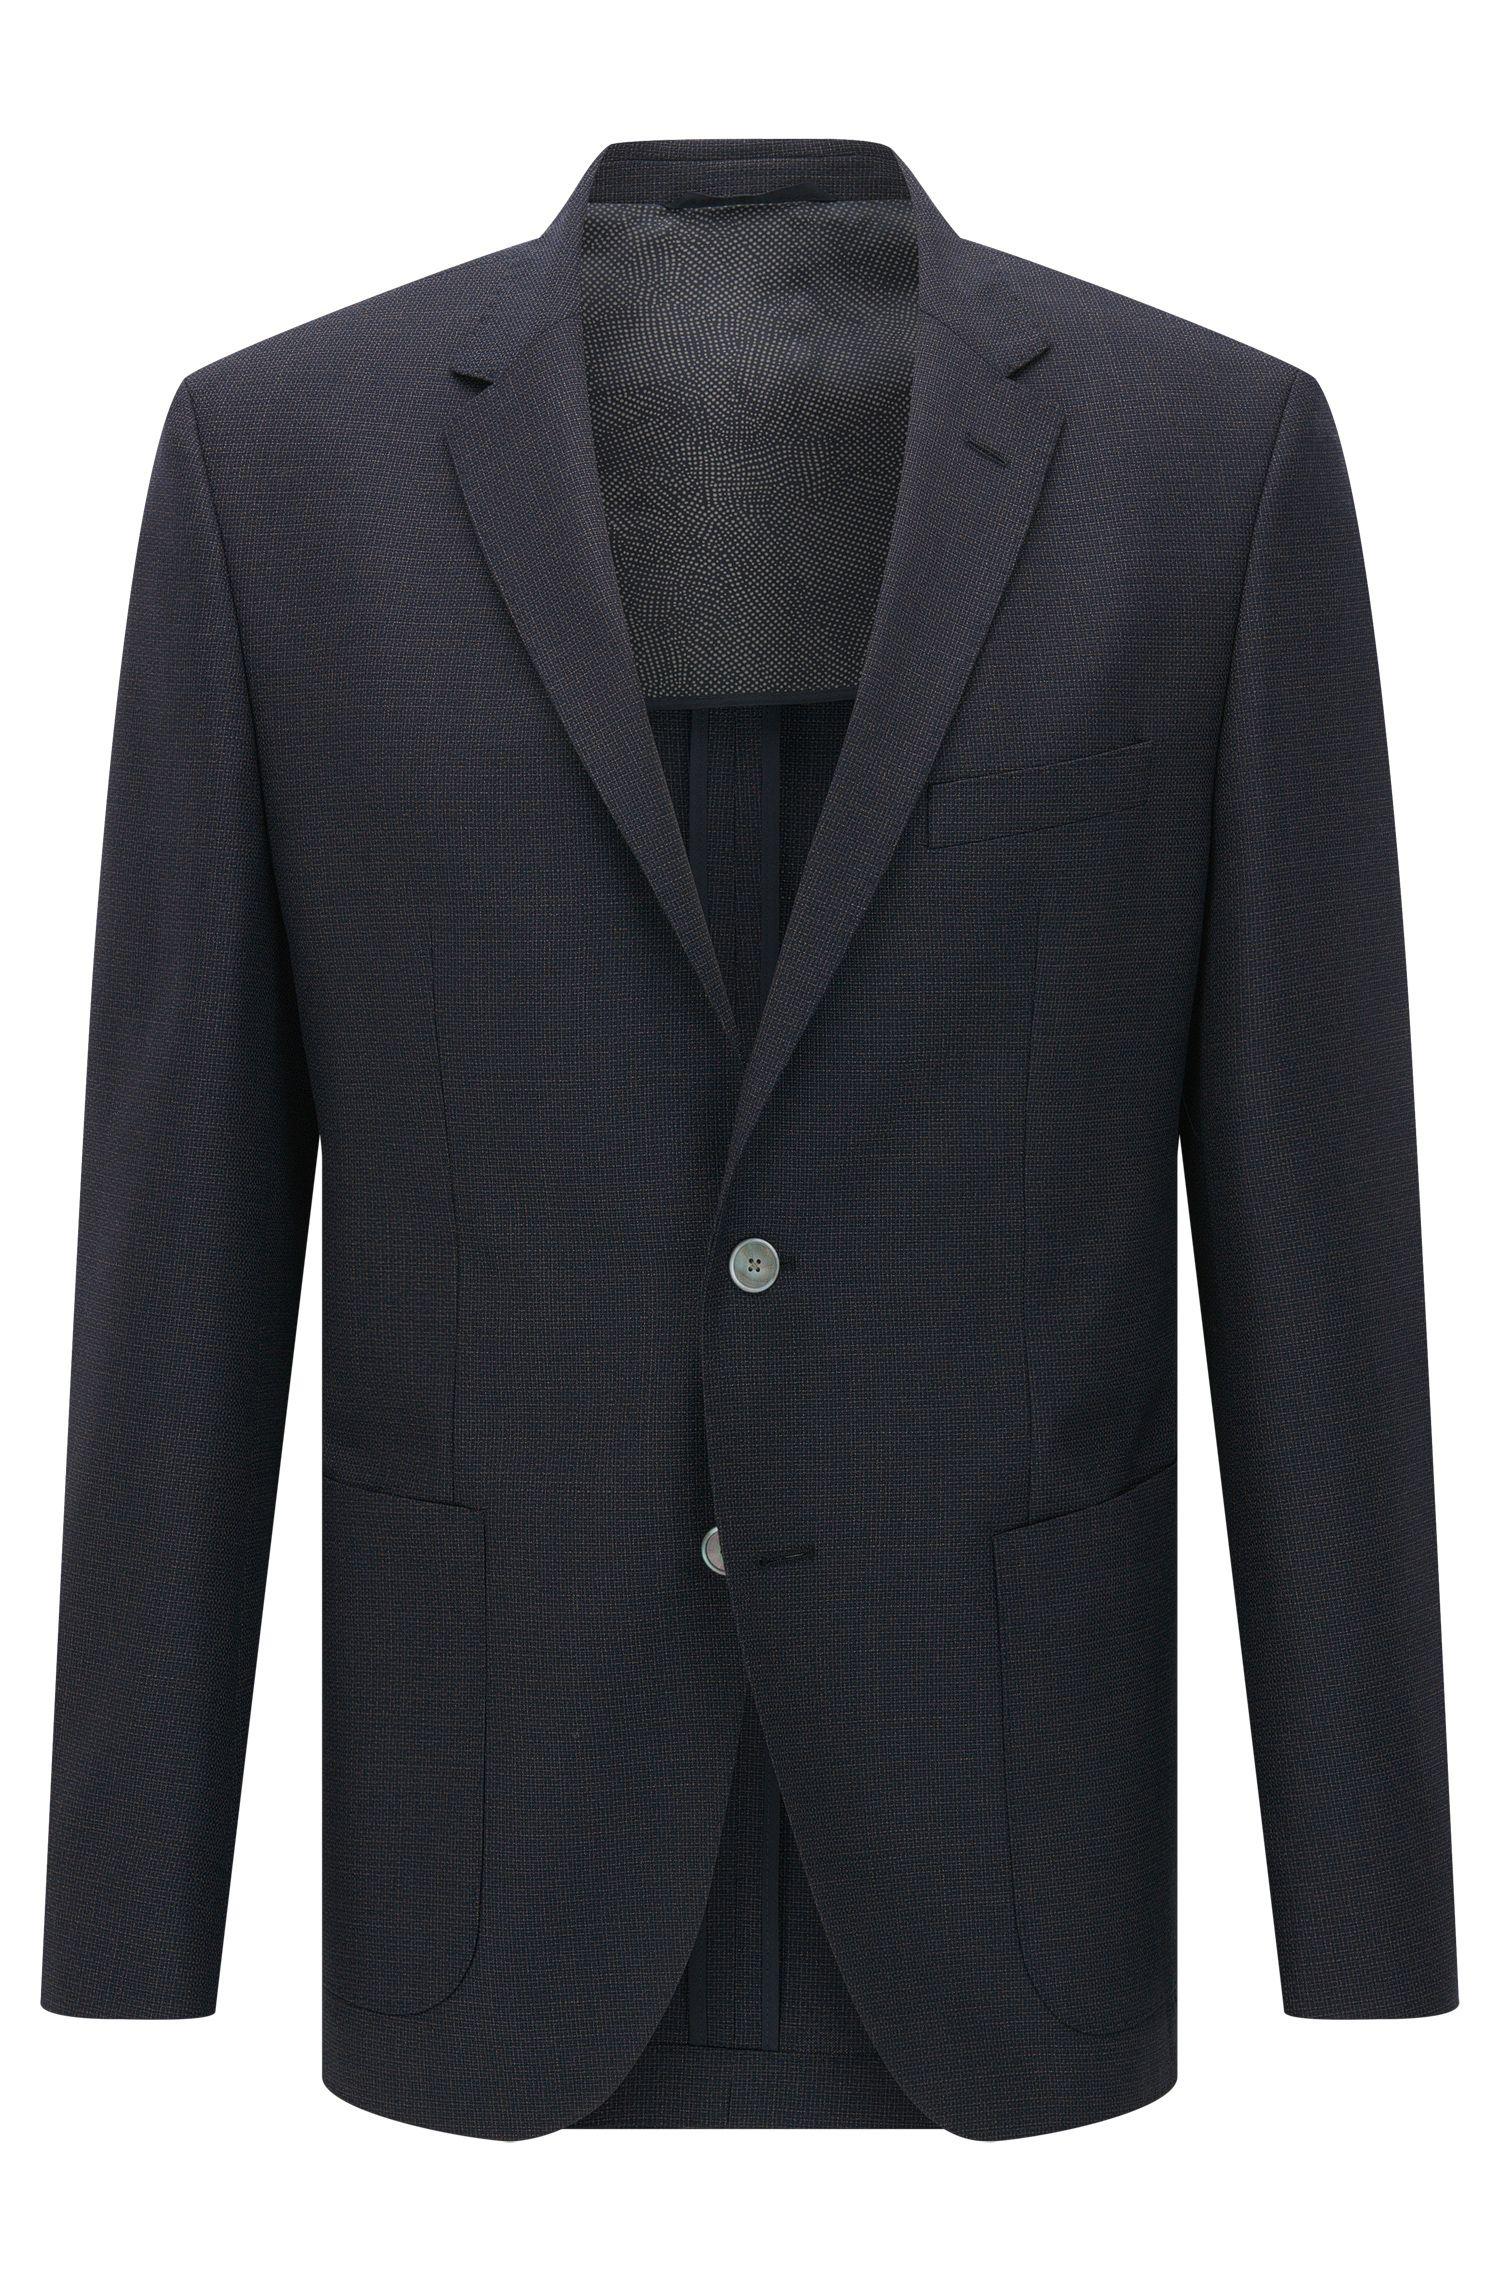 'Janson' | Regular Fit, Italian Super 120 Virgin Wool Sport Coat